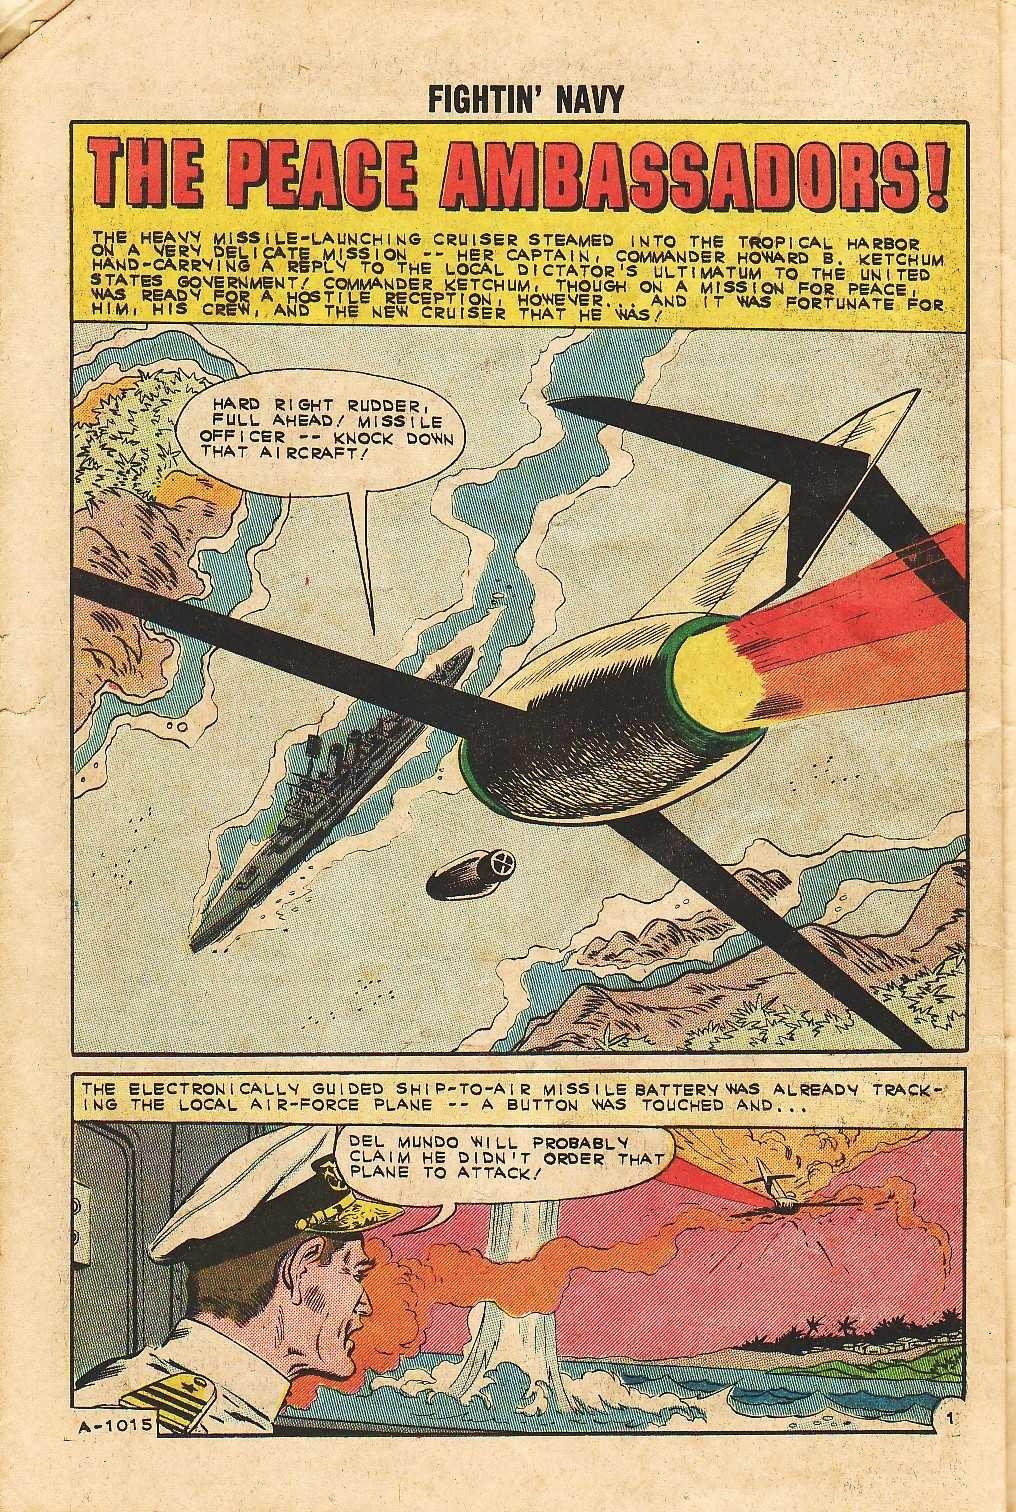 Read online Fightin' Navy comic -  Issue #105 - 26